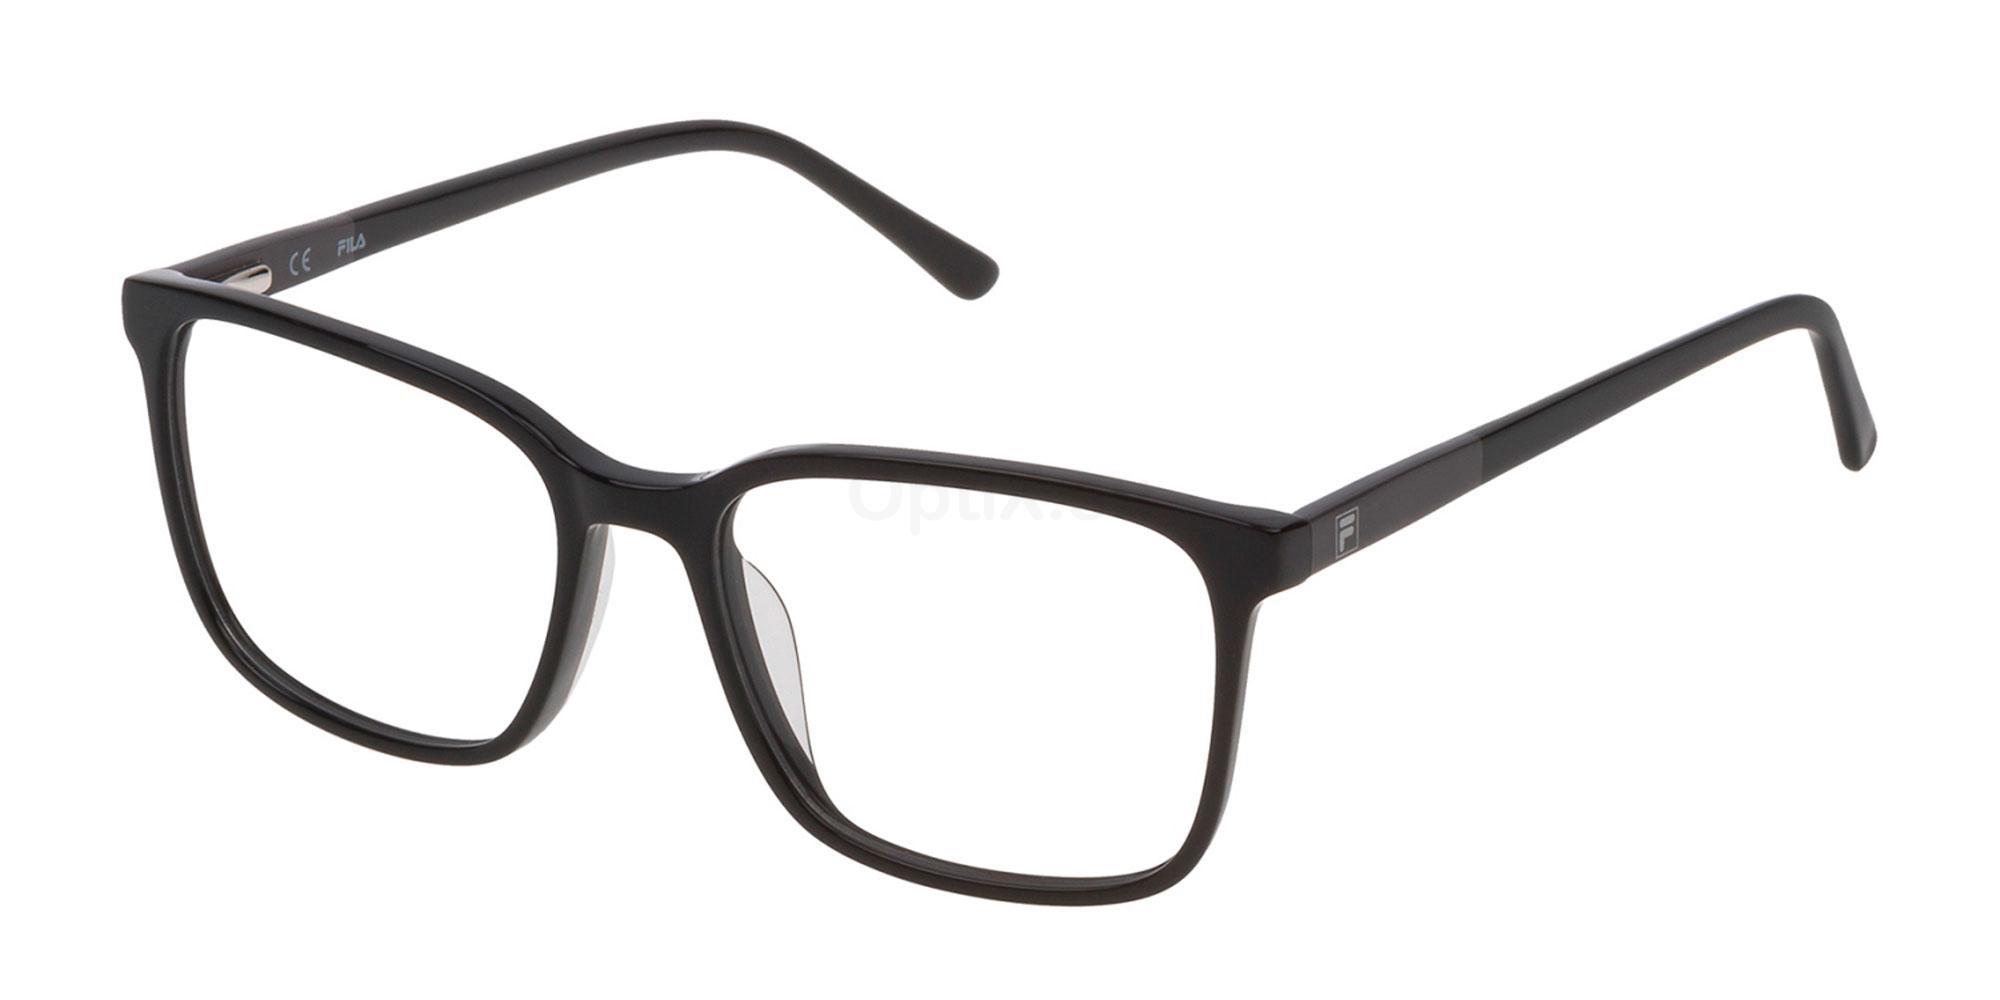 0700 VF9170 Glasses, Fila